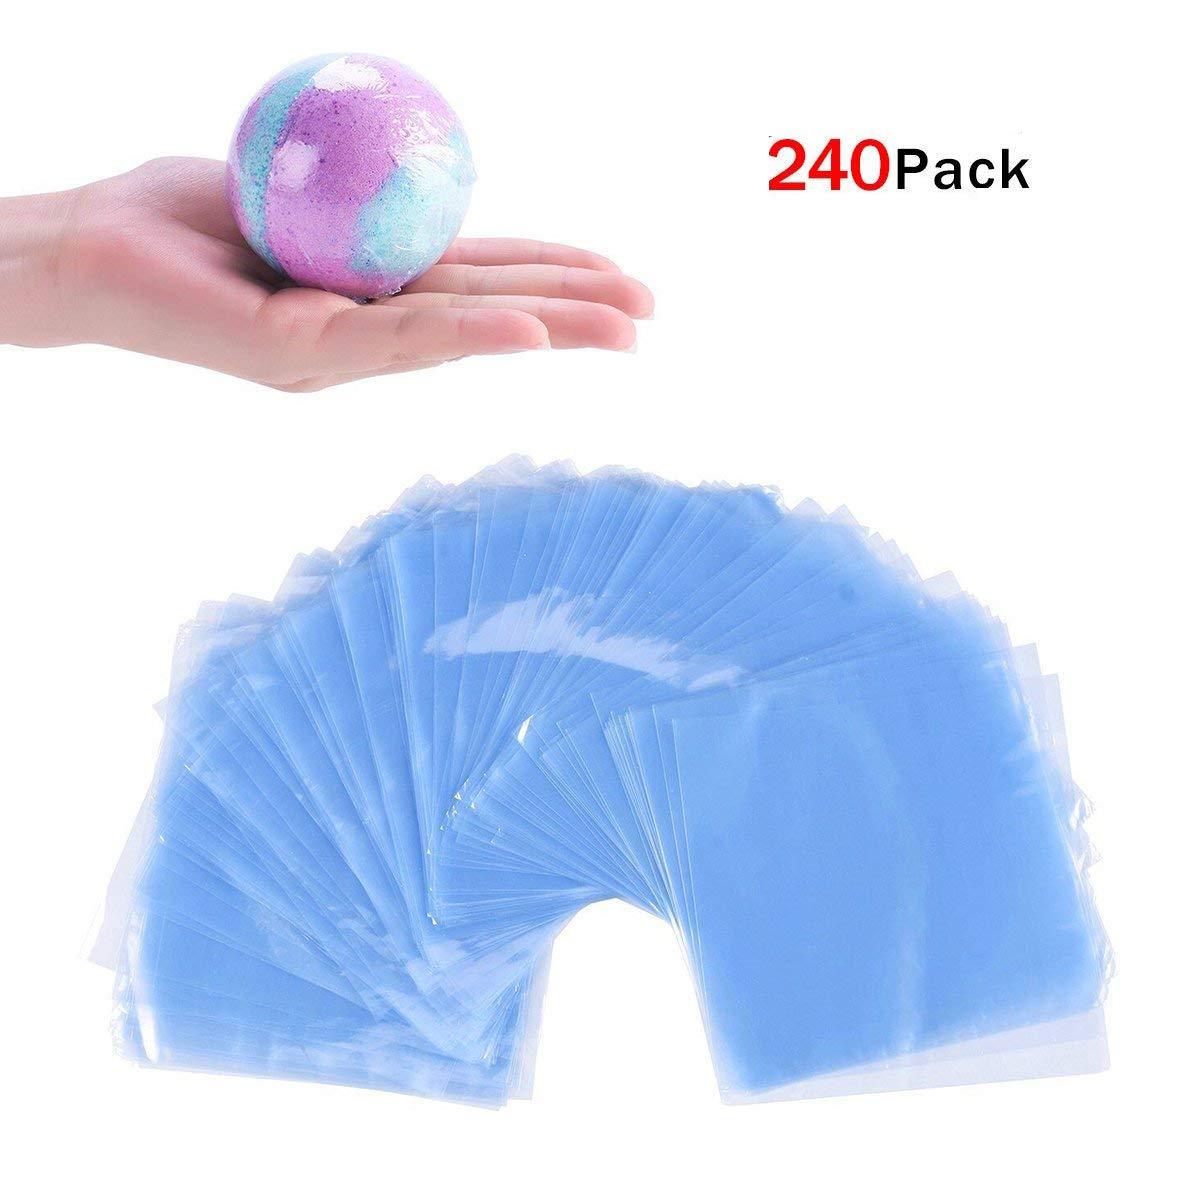 JER Heat Shrink Wrap Bags 240Pcs Clear Shrink Film Bag Odorless Heat Seal Packs for Bath Bombs DIY Handmade Crafts